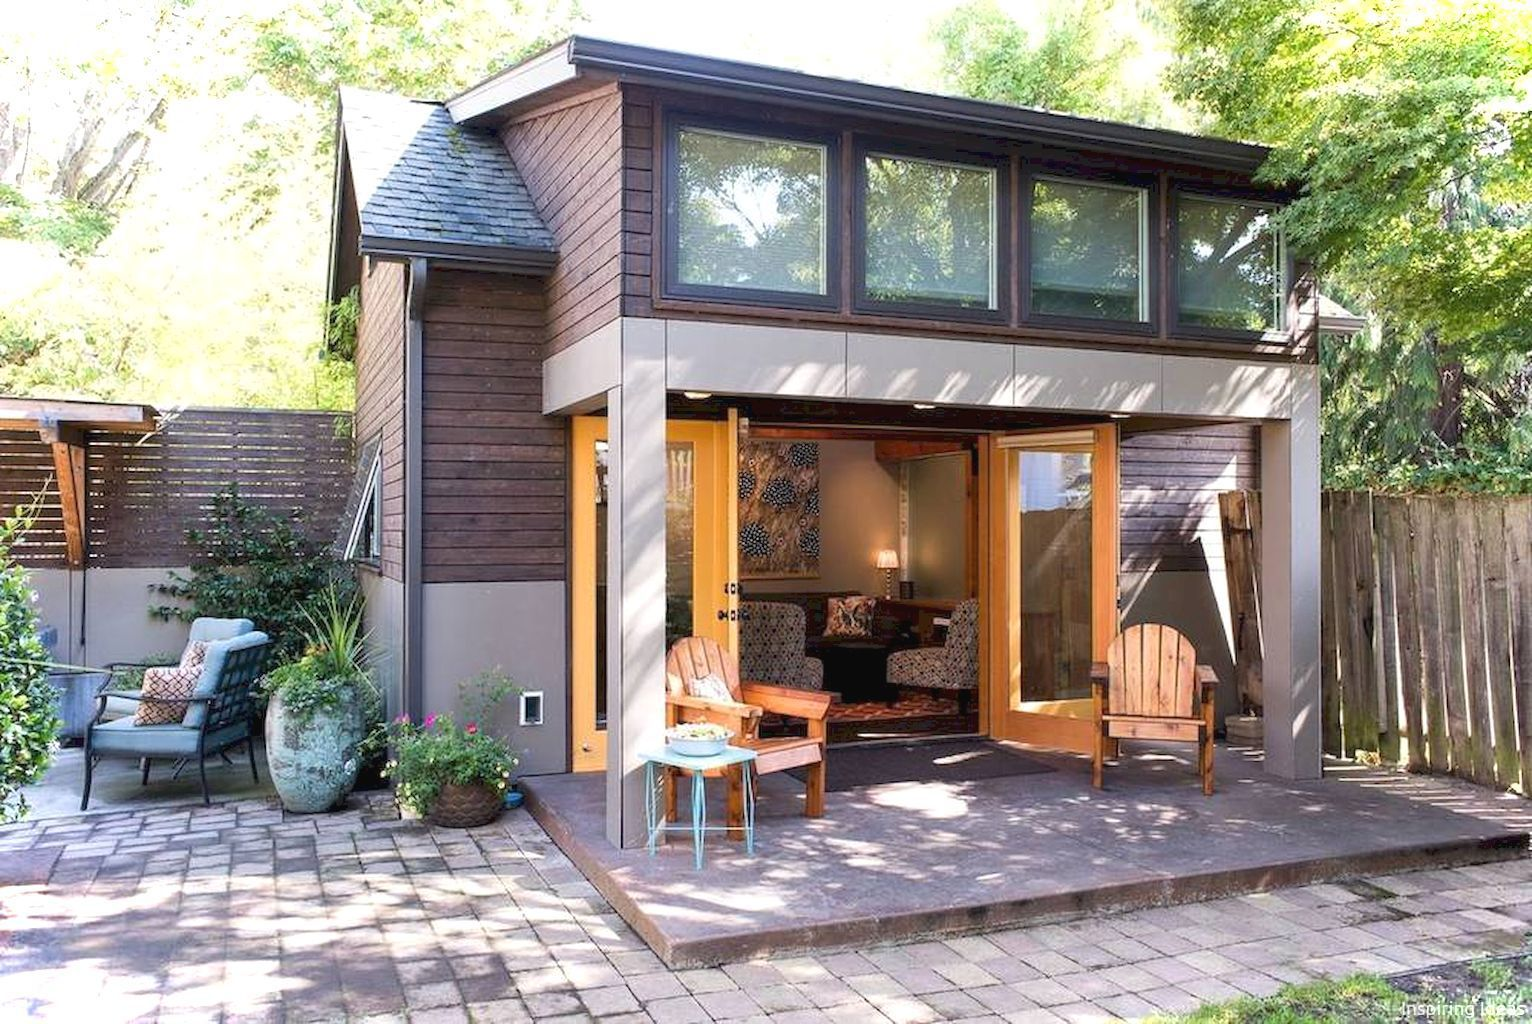 71 Awesome Tiny House Interior Ideas Tiny Houses For